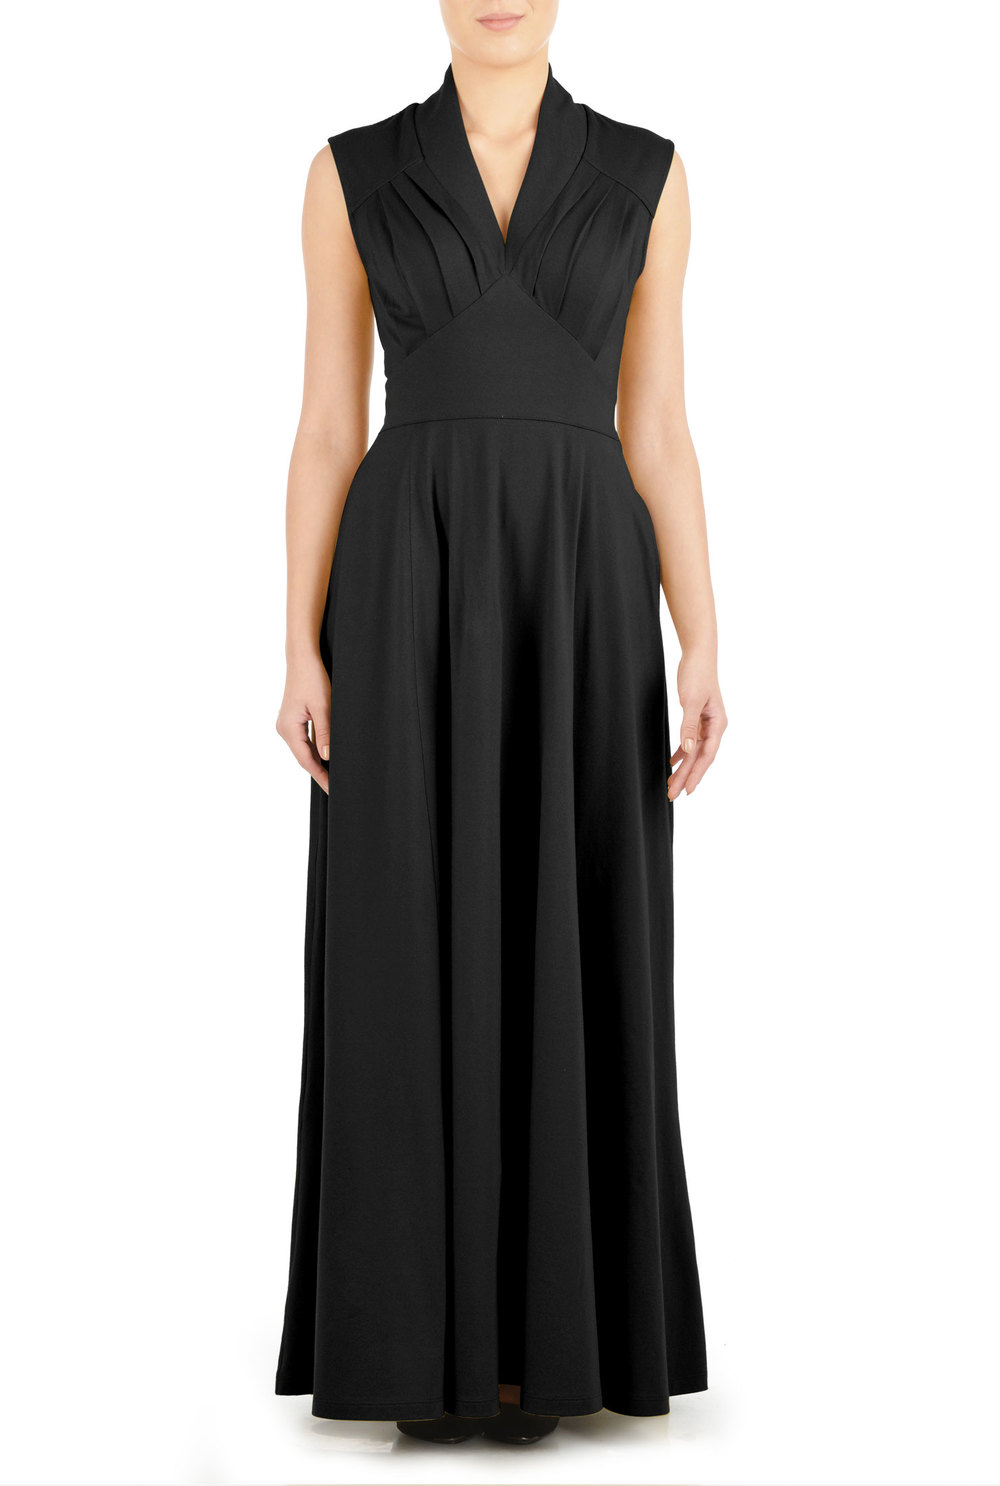 FEMININE PLEATED KNIT MAXI DRESS.eShakti. $69.Available: Additional 9 neckline, 7 sleeve type and 7 length option(s). Cotton!